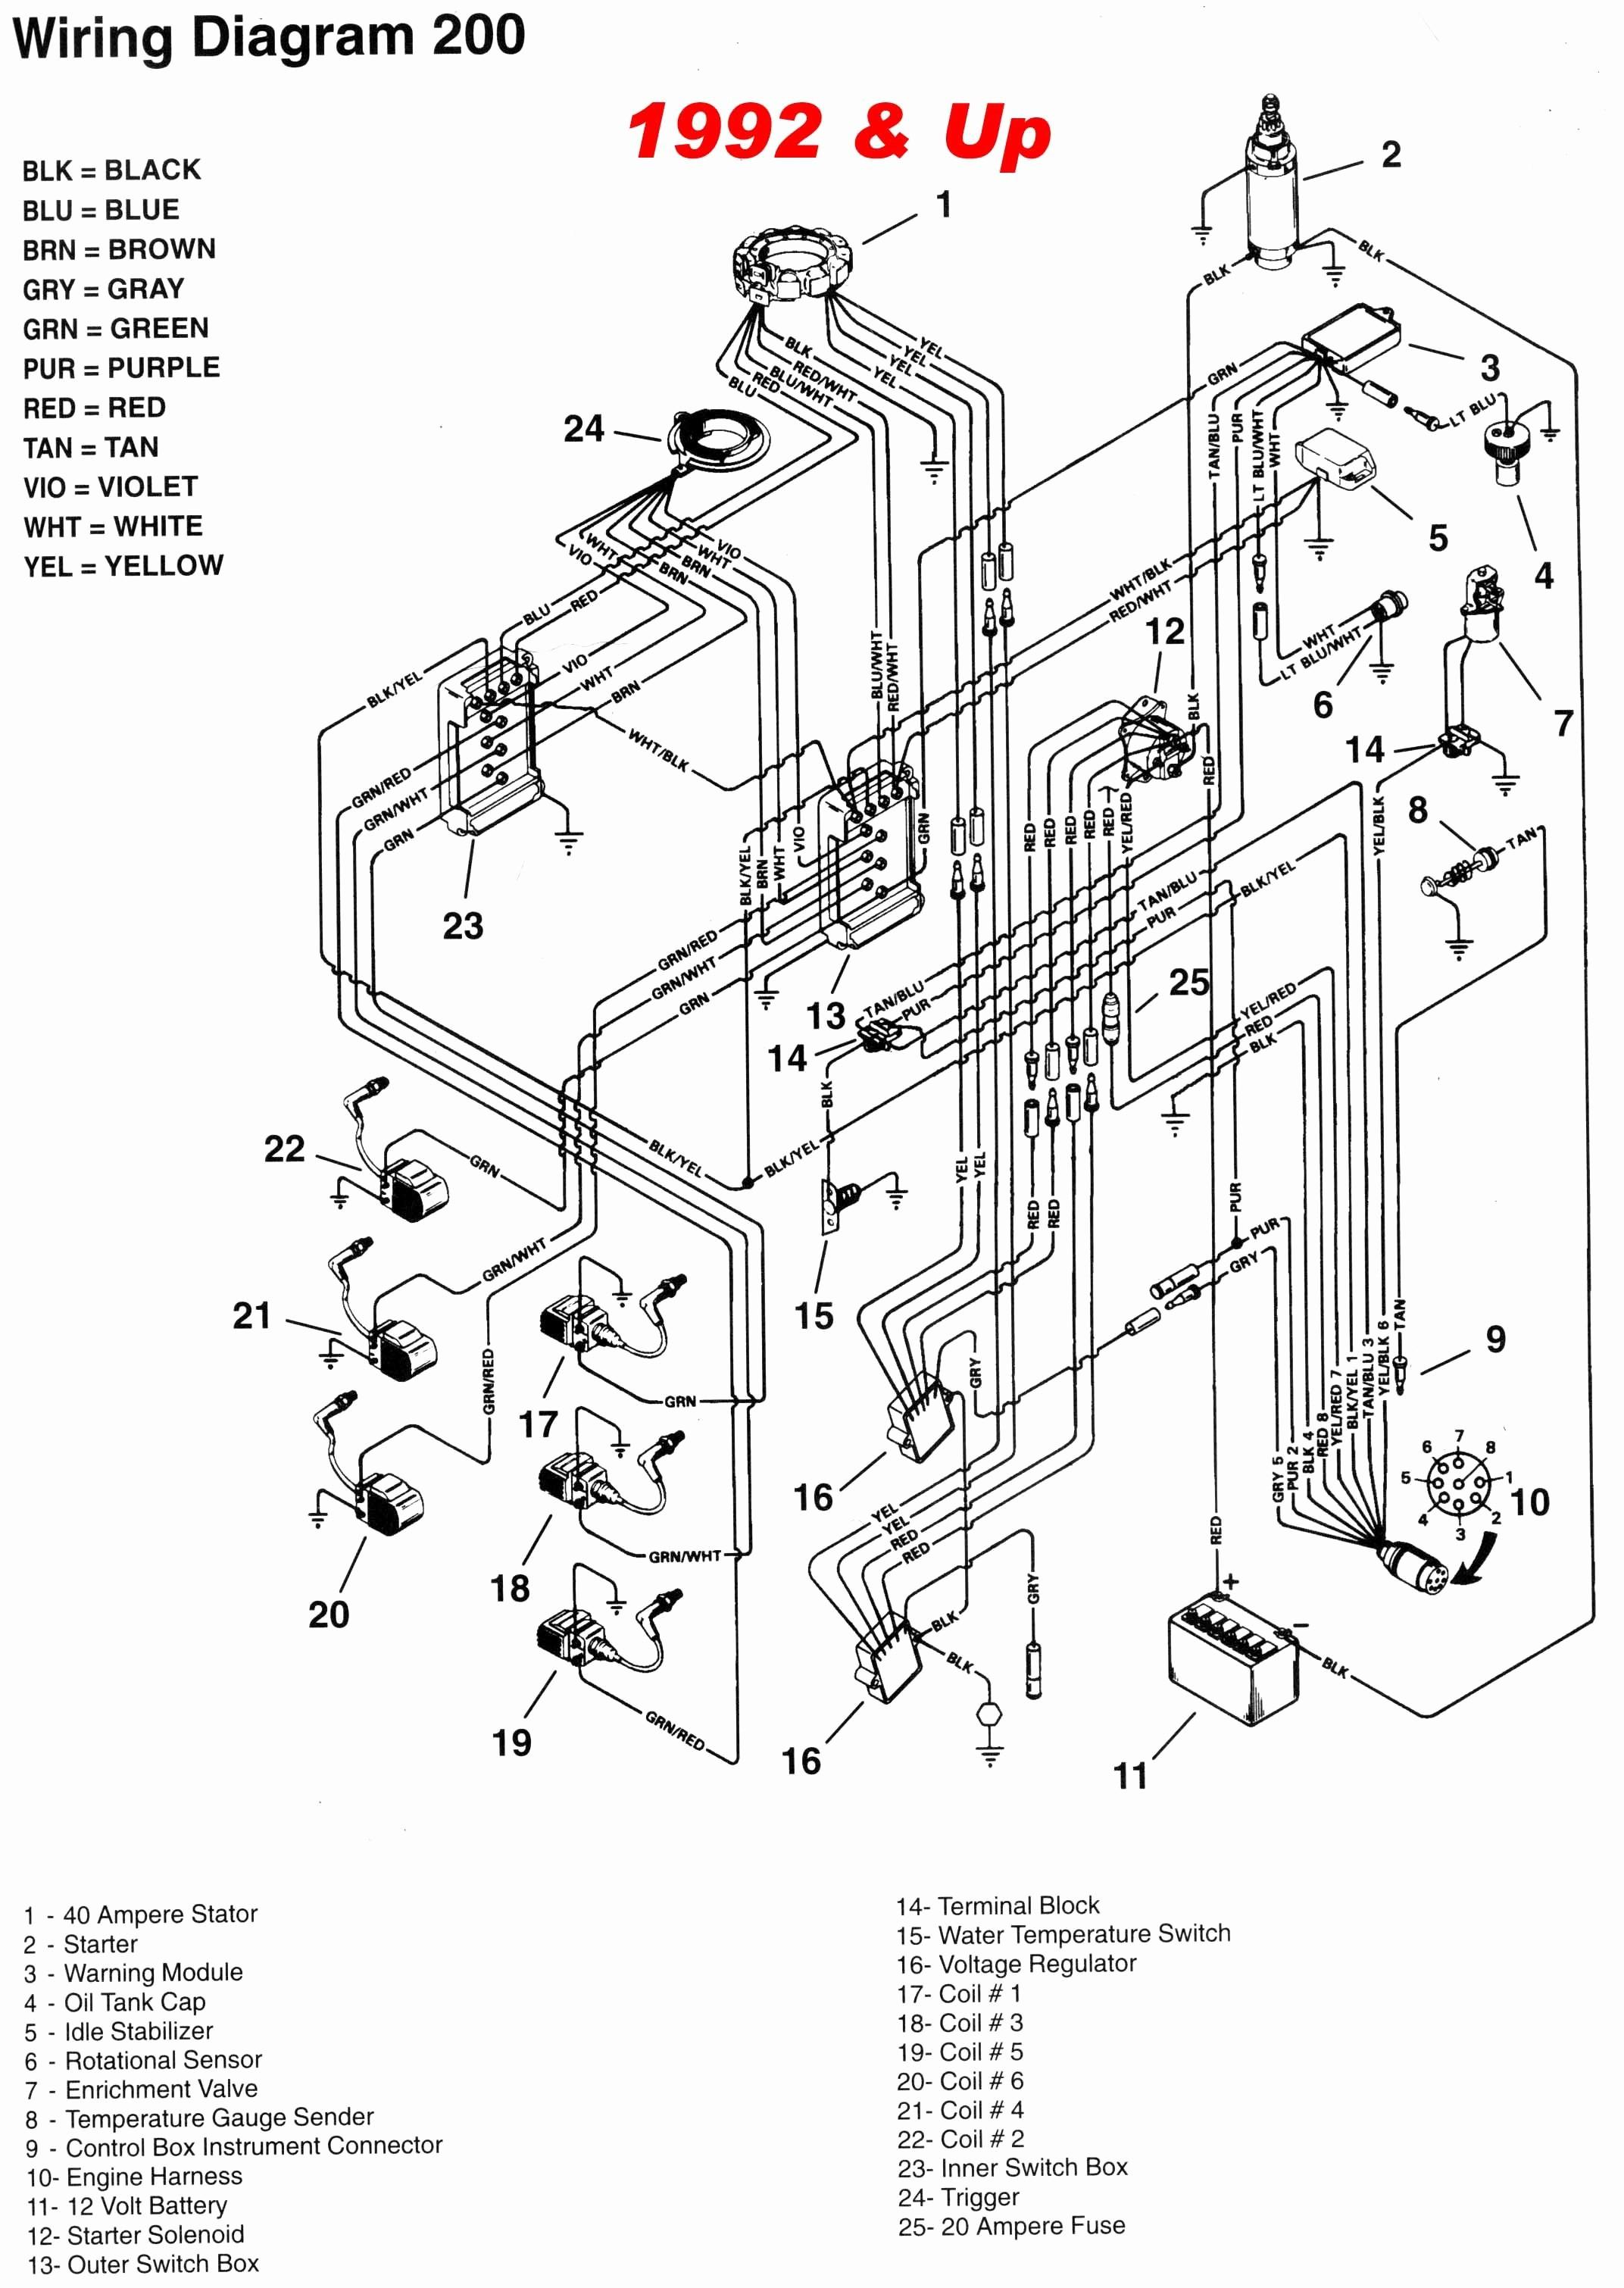 2002 Mercury Cougar Engine Diagram Wiring Harness Diagram Further Mercruiser Wiring Harness Diagram Of 2002 Mercury Cougar Engine Diagram